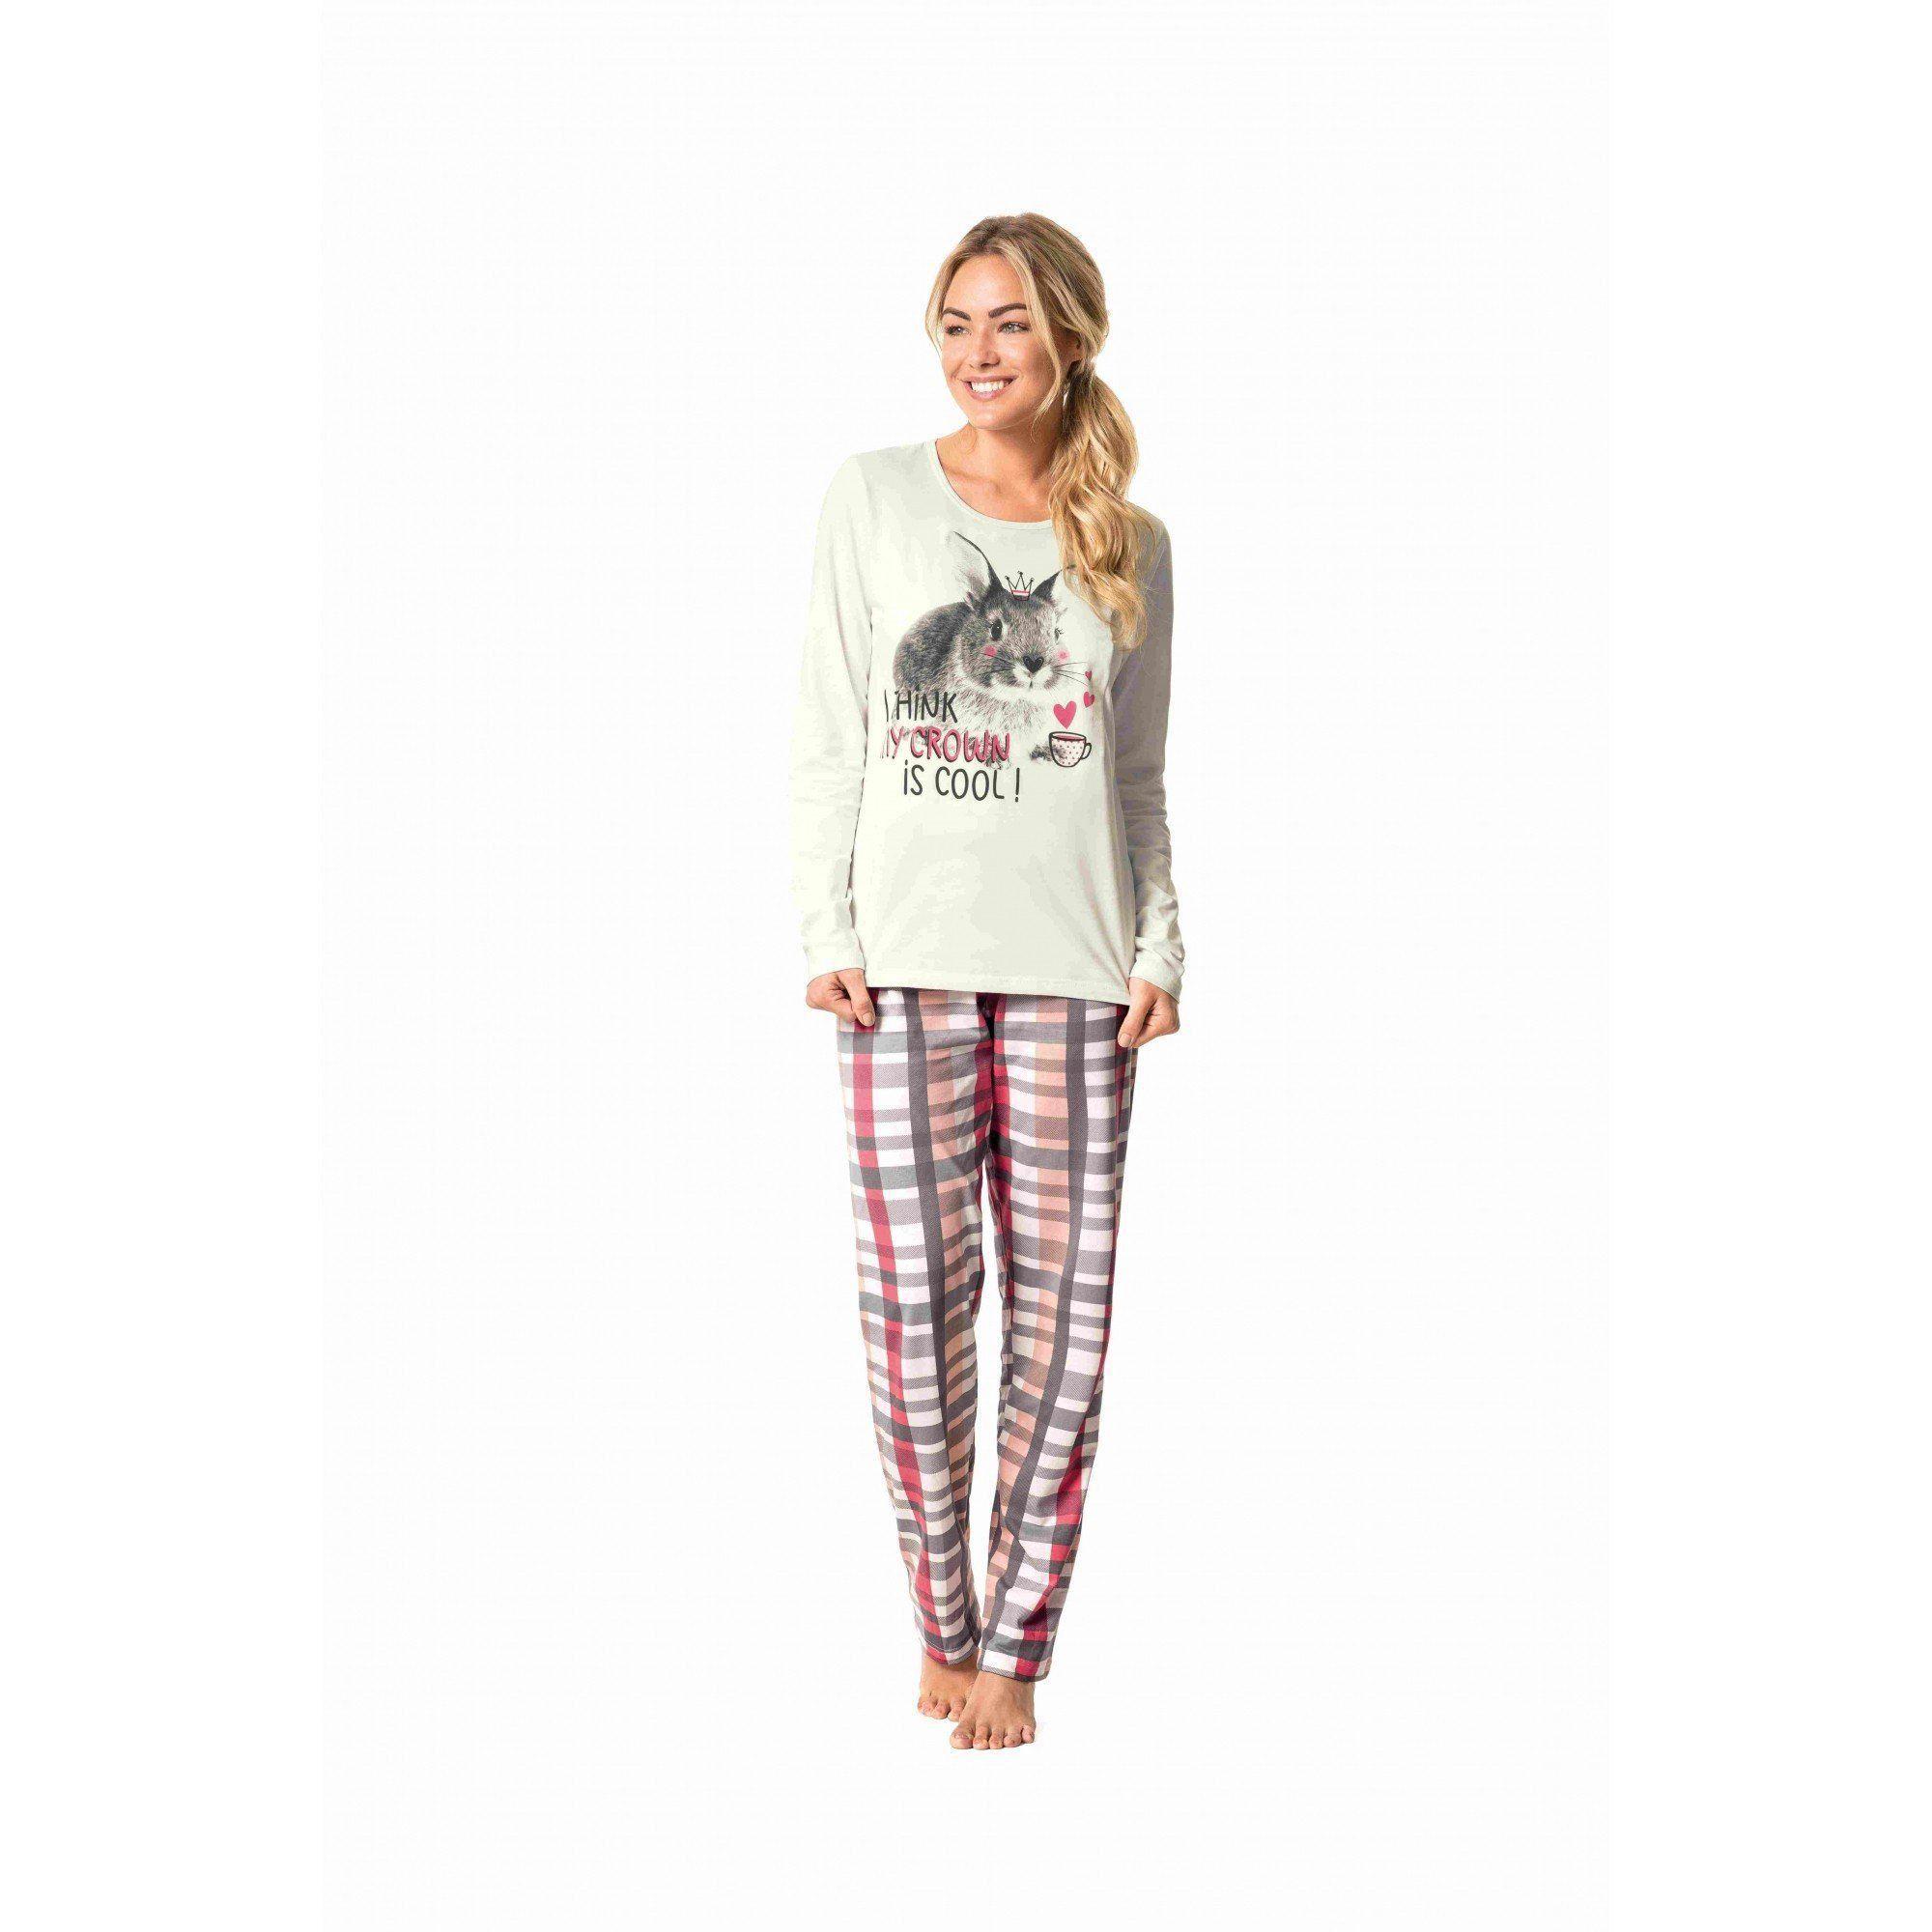 Pijama ADULTO Feminino Inverno OffWhite Coelho Malwee